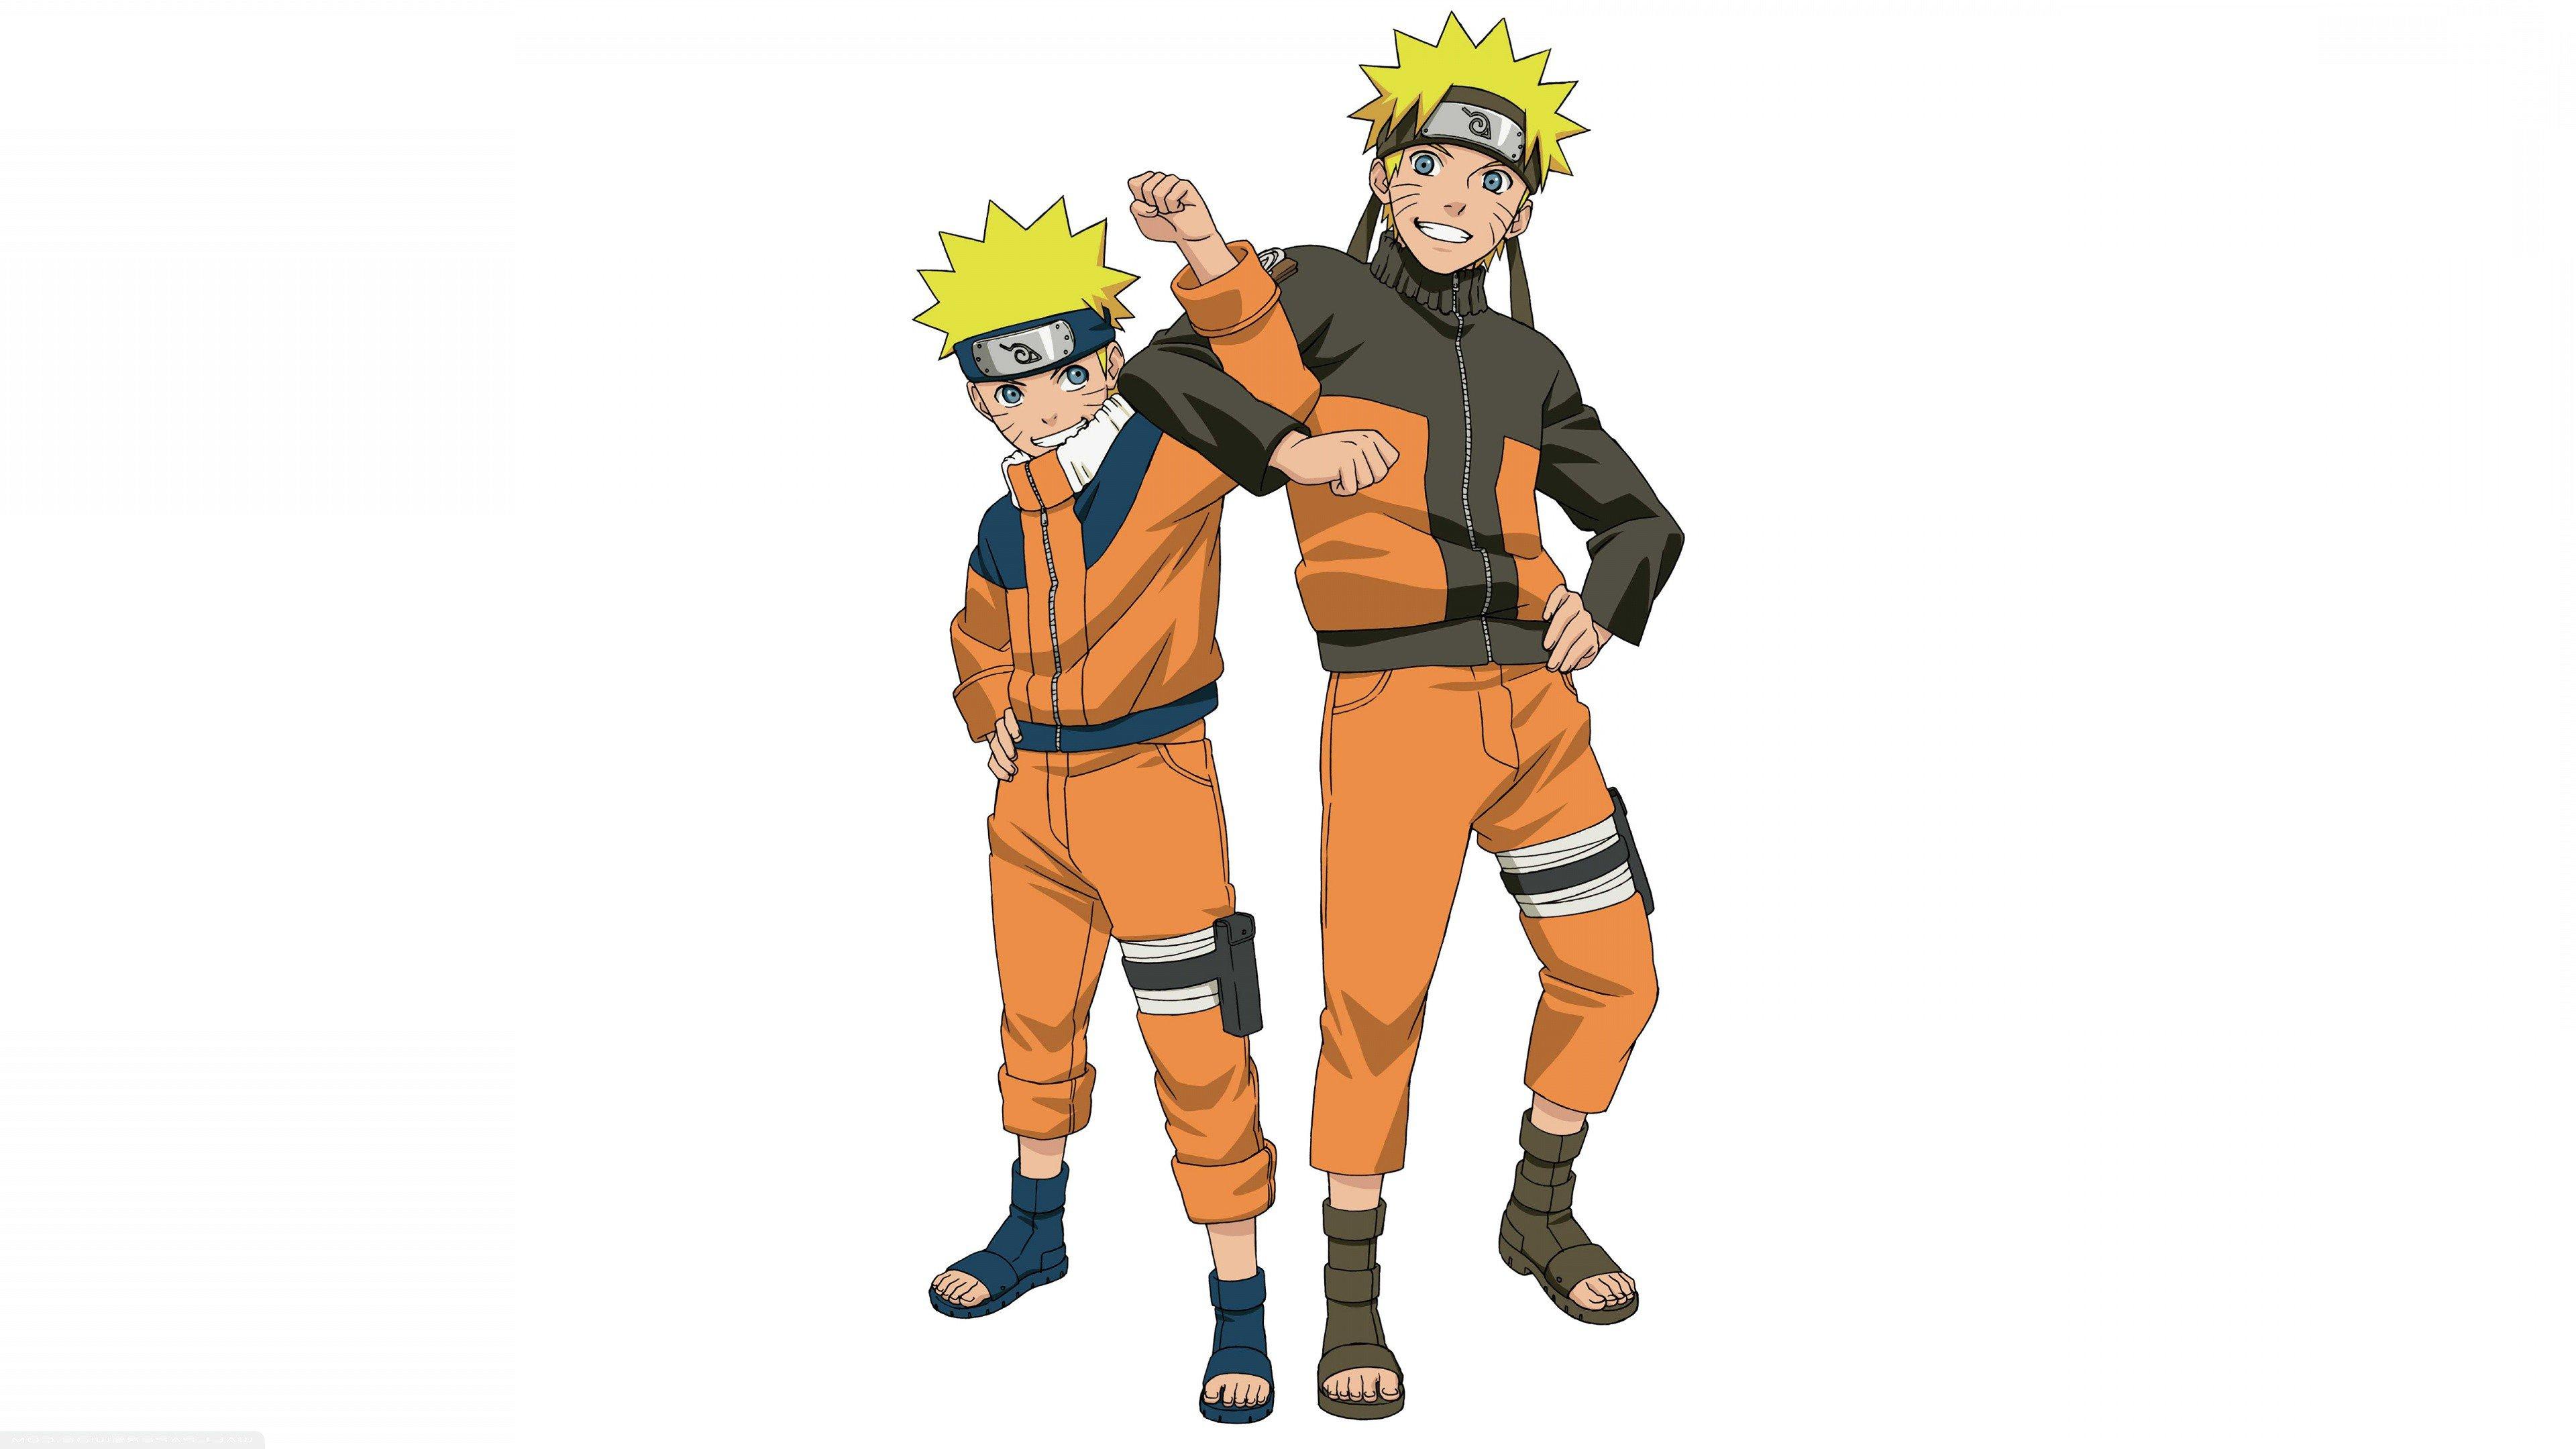 naruto 1541973519 - Naruto - naruto wallpapers, anime wallpapers